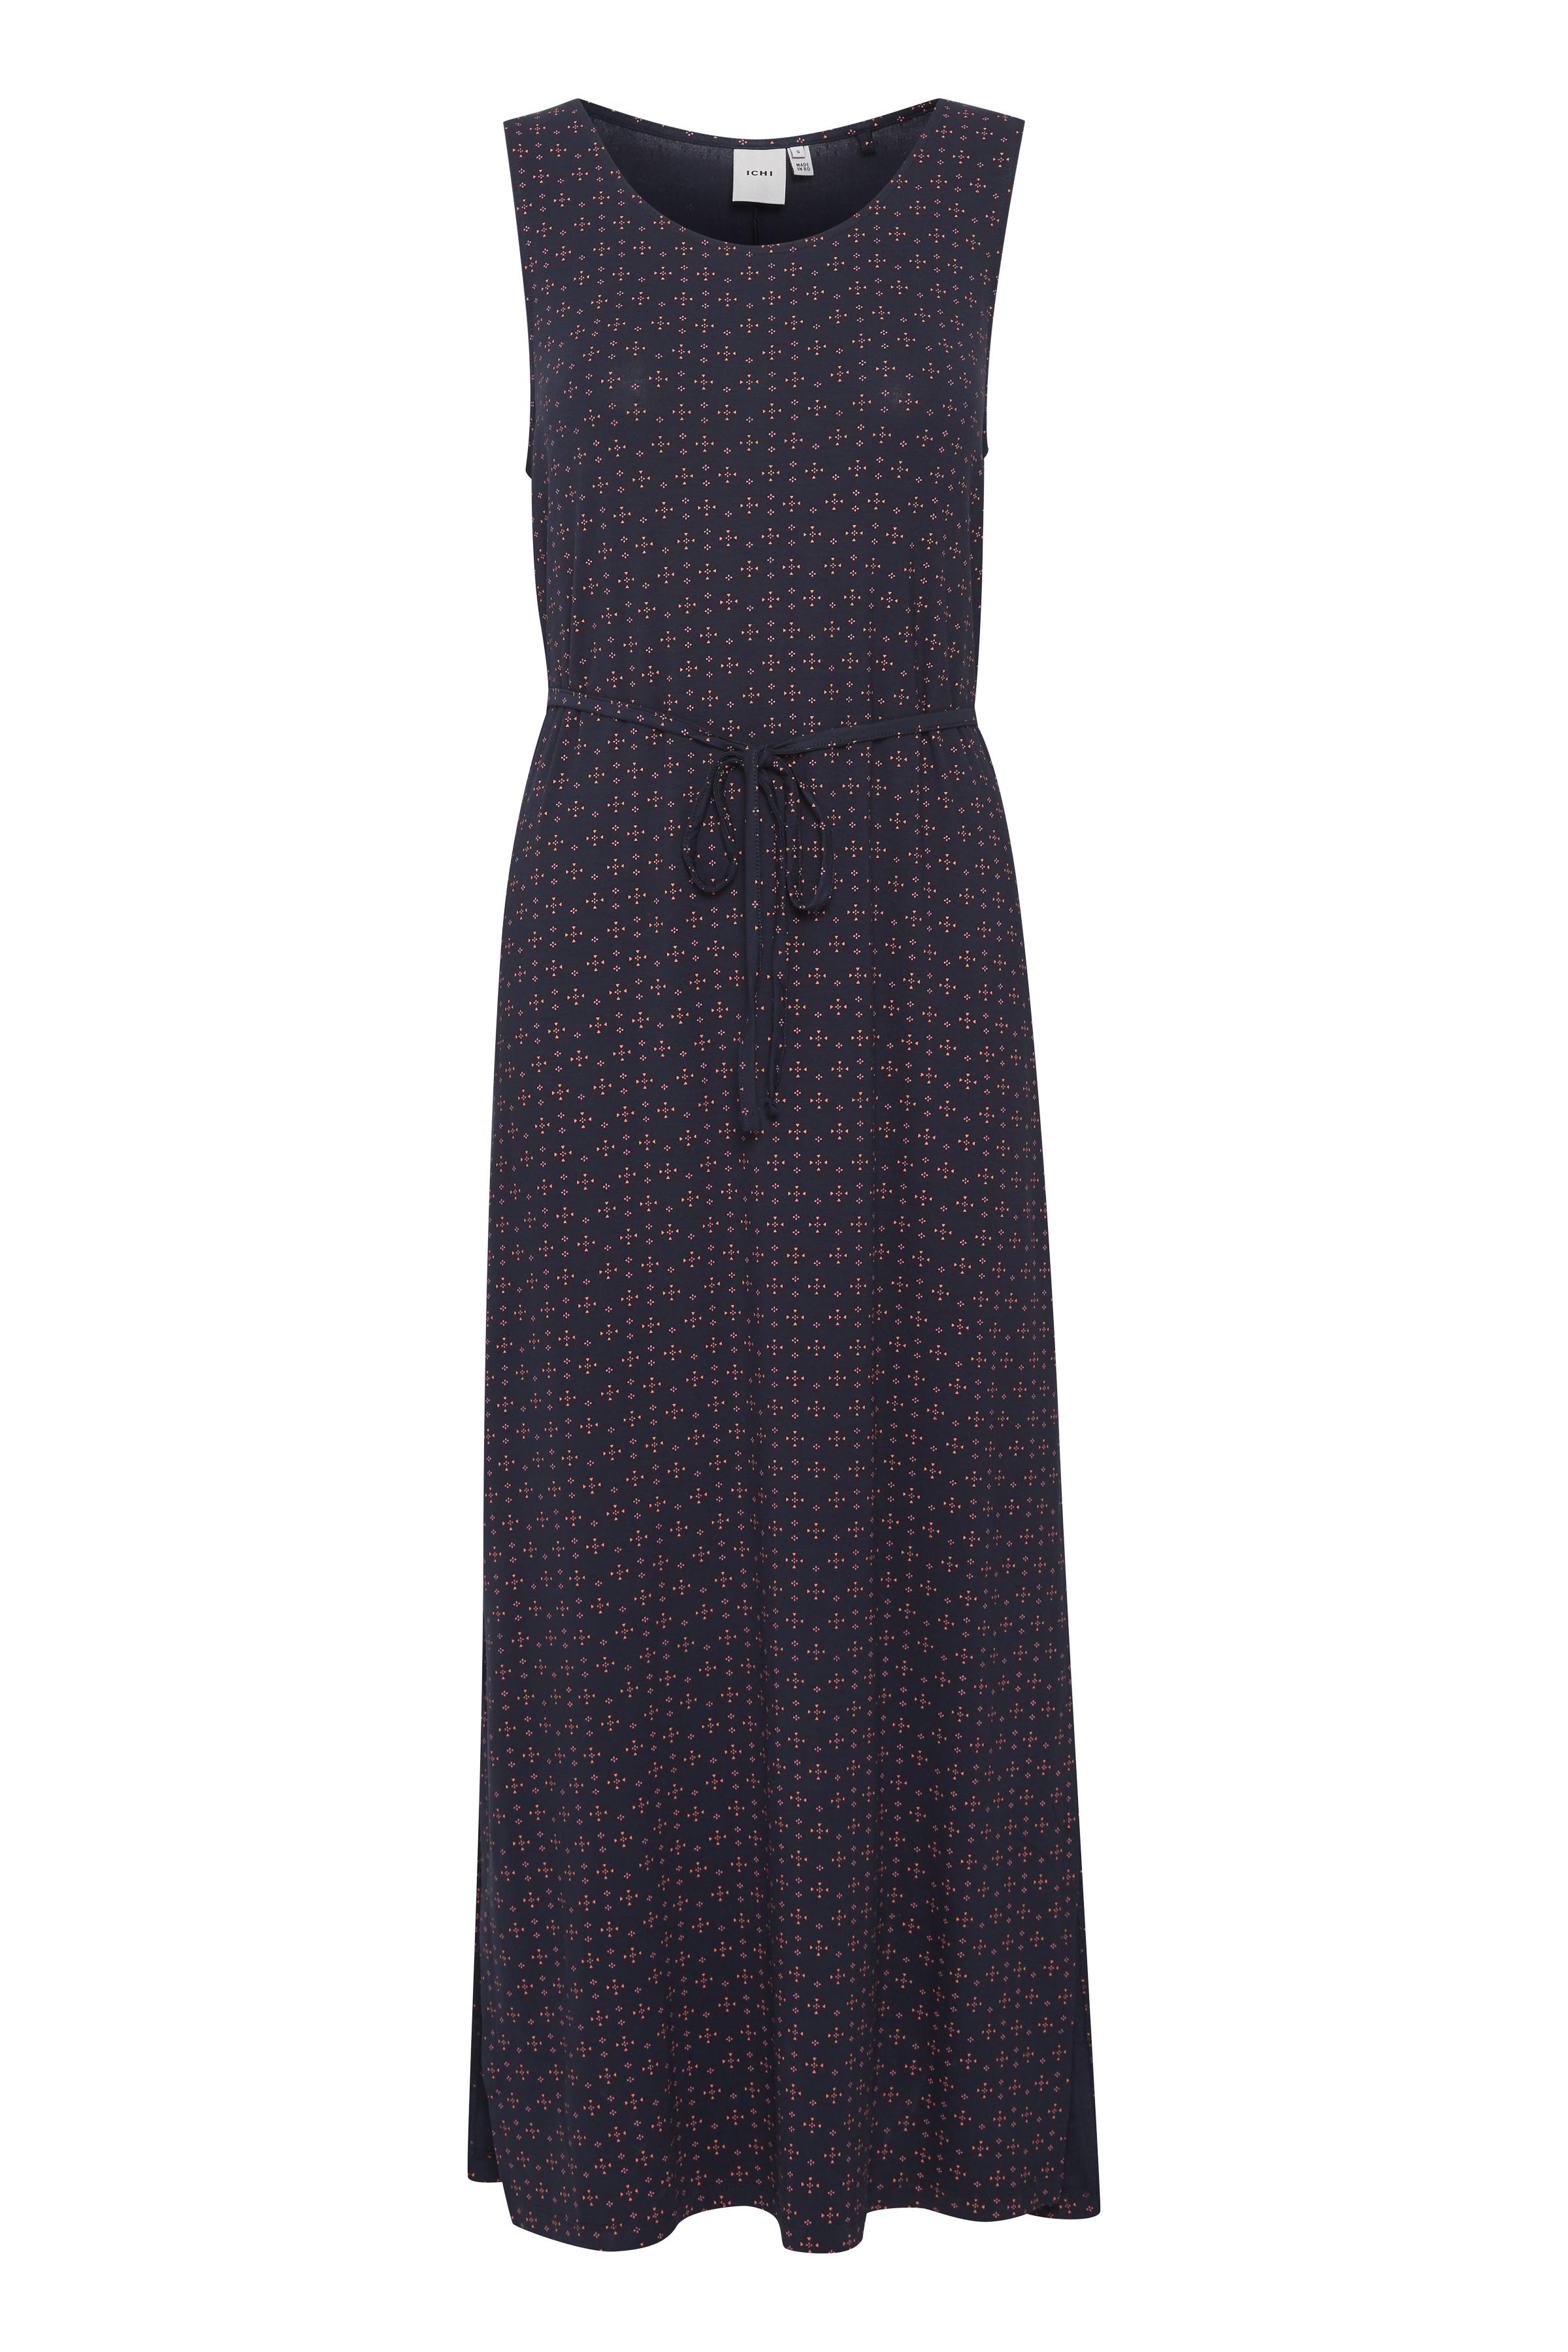 Ichi Dame Jersey jurk - Total Eclipse